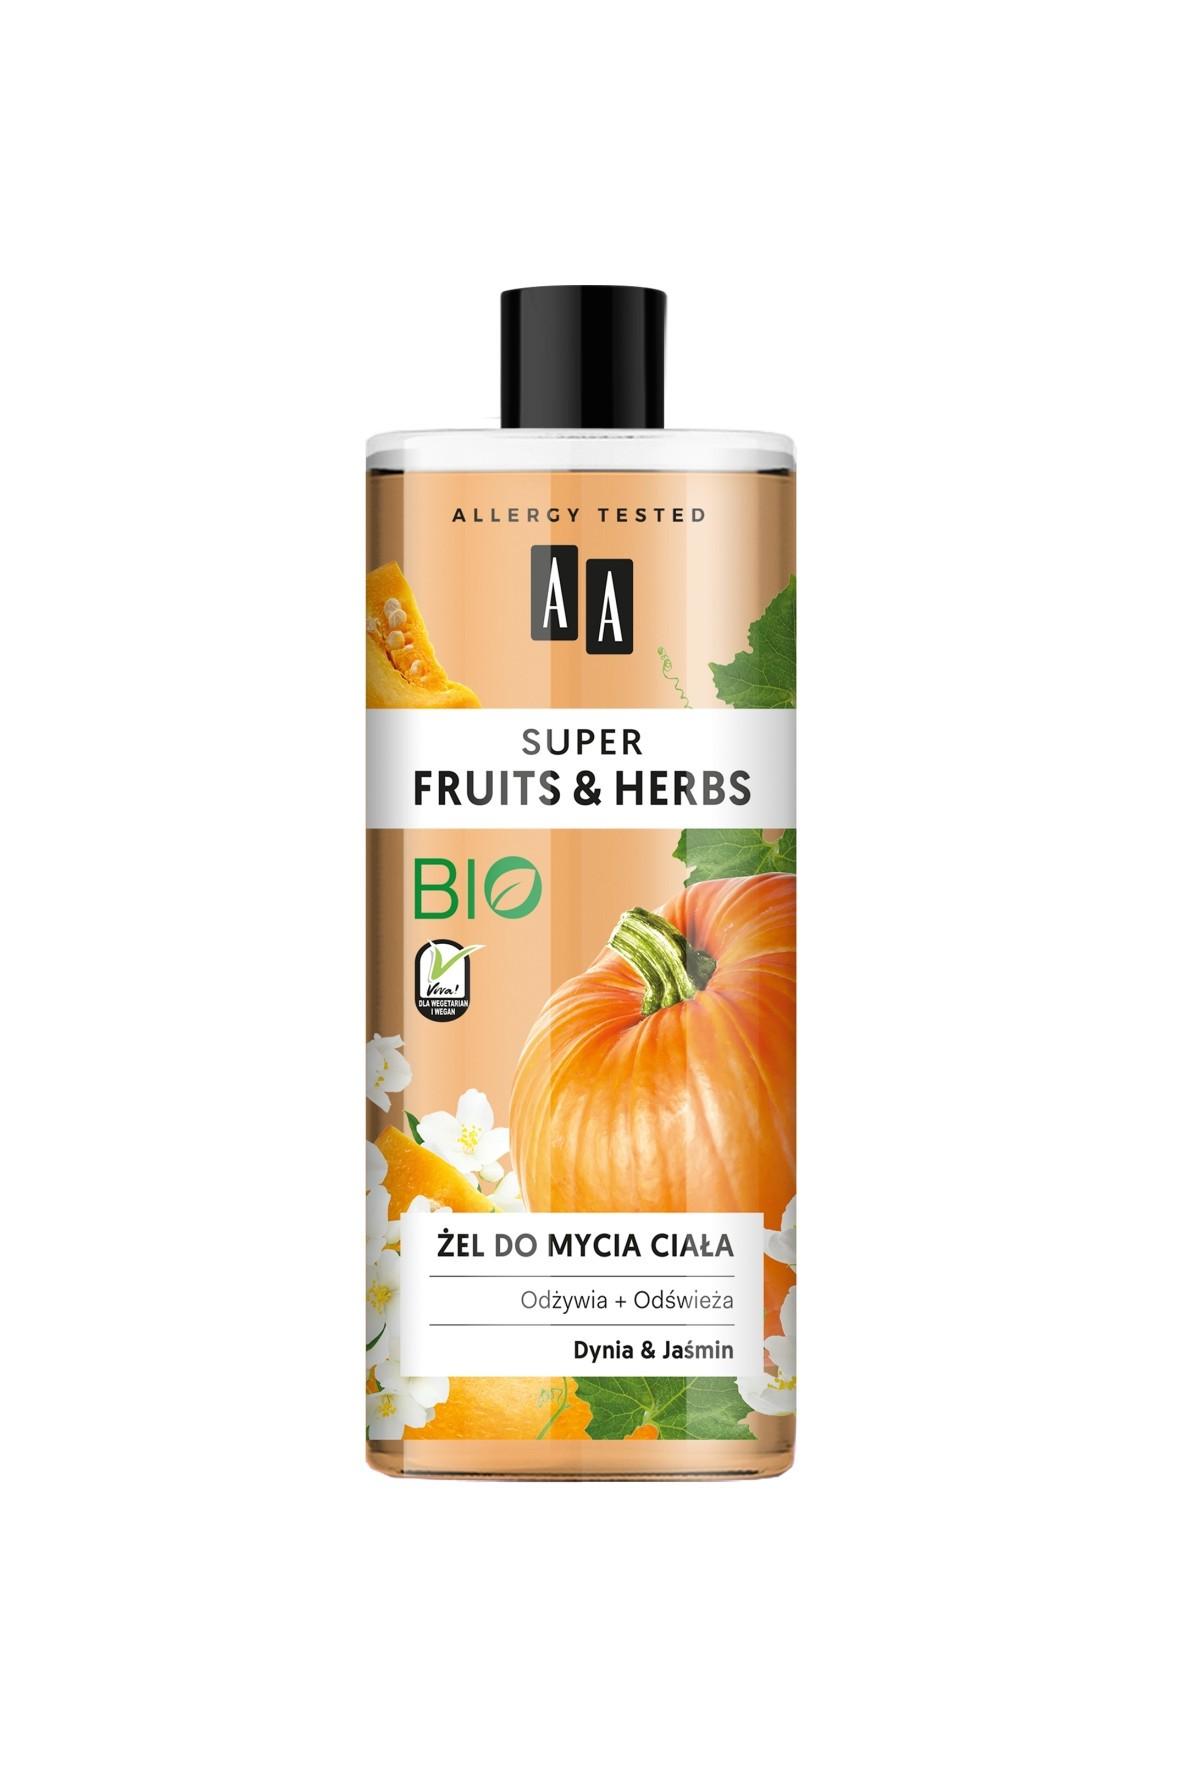 AA Super Fruits&Herbs żel do mycia ciała dynia&jaśmin 500 ml